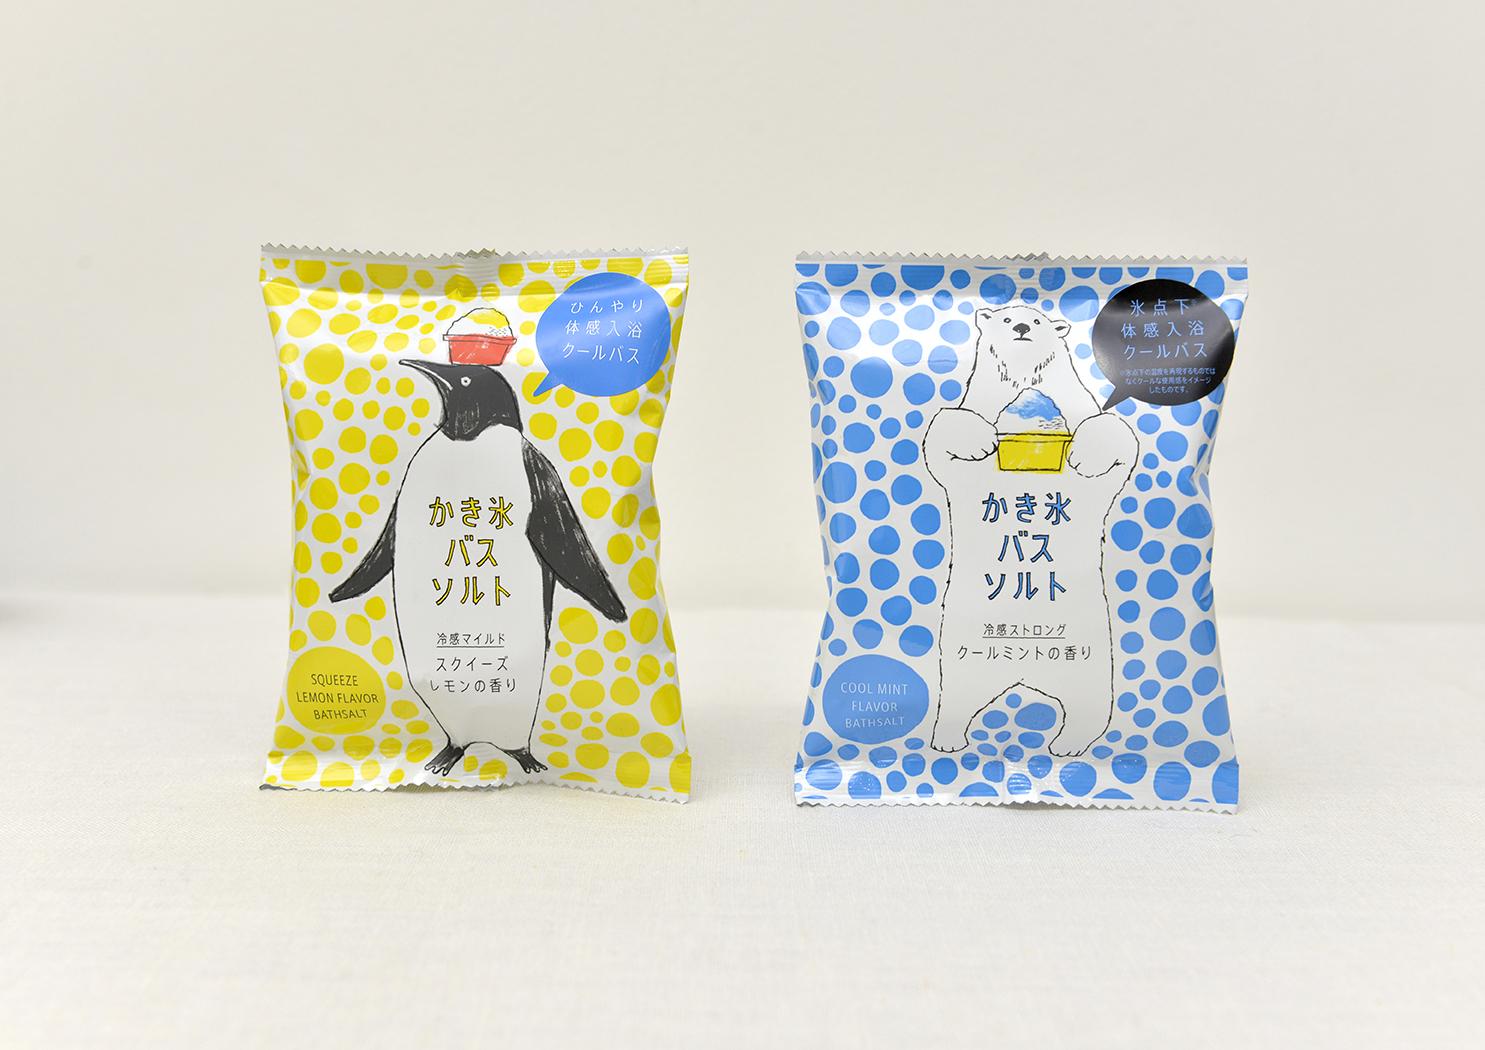 CHARLEY Kakigoori Bath salt